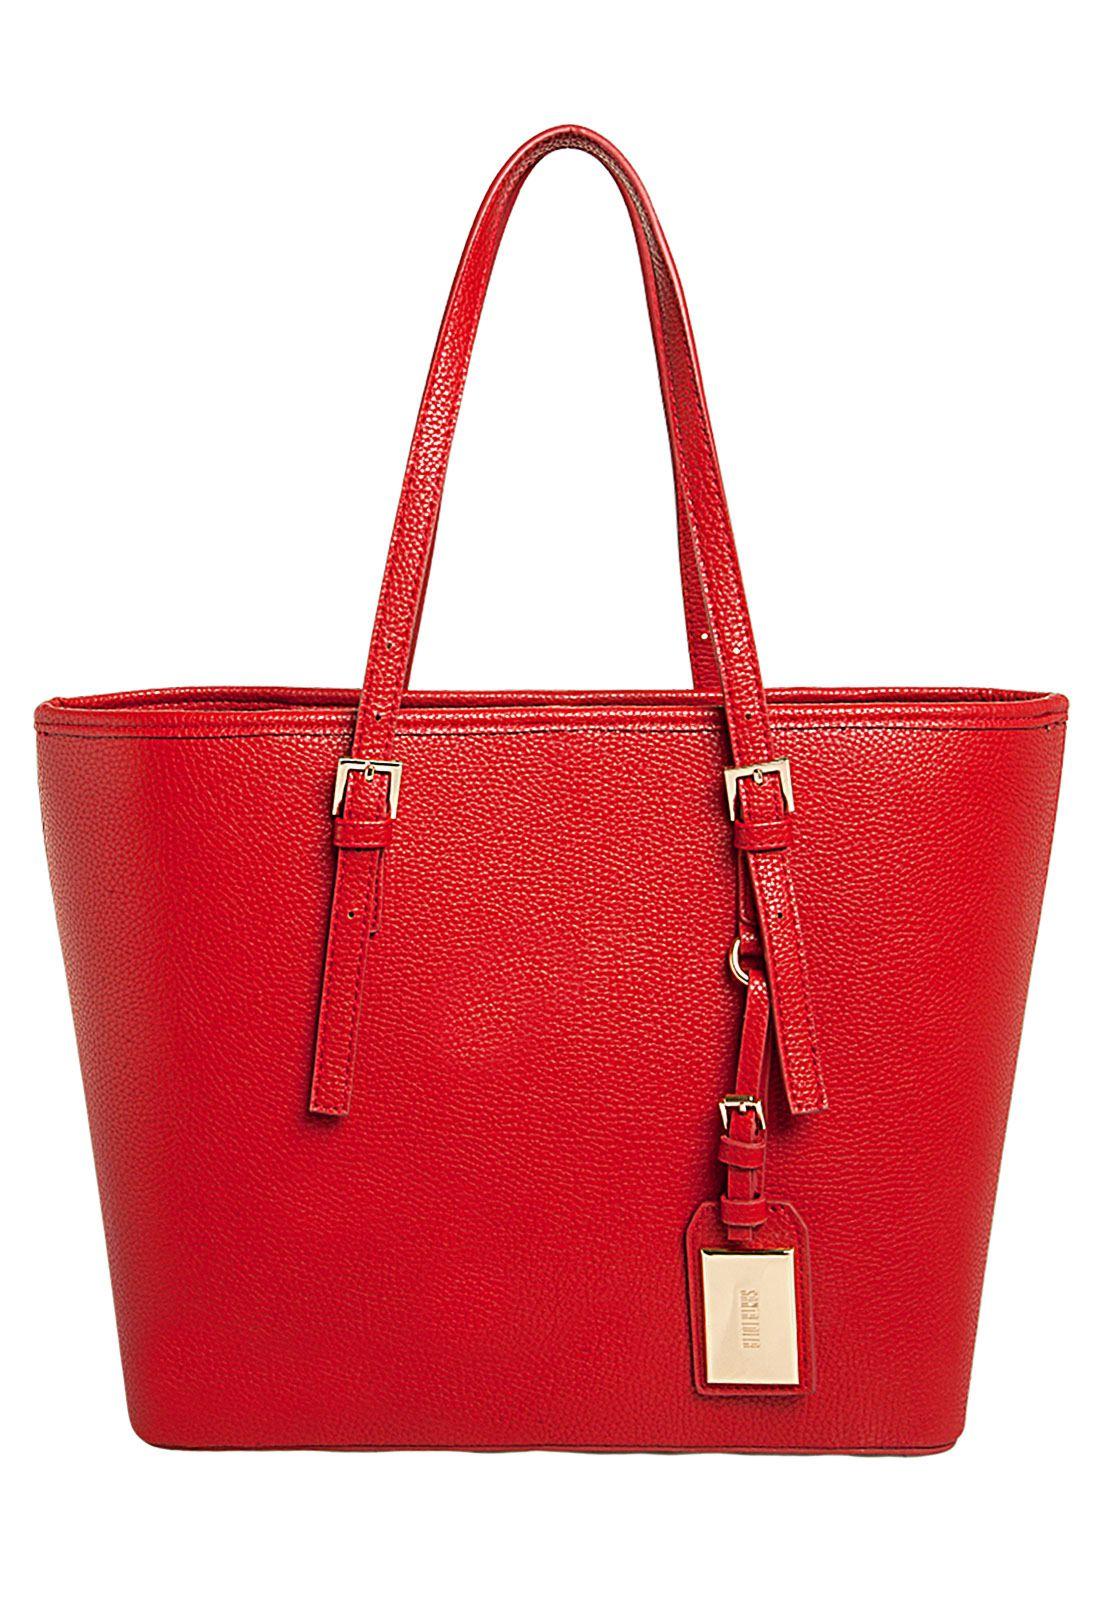 e00c1df2b4134 Bolsa Santa Lolla Clean Vermelha - Compre Agora